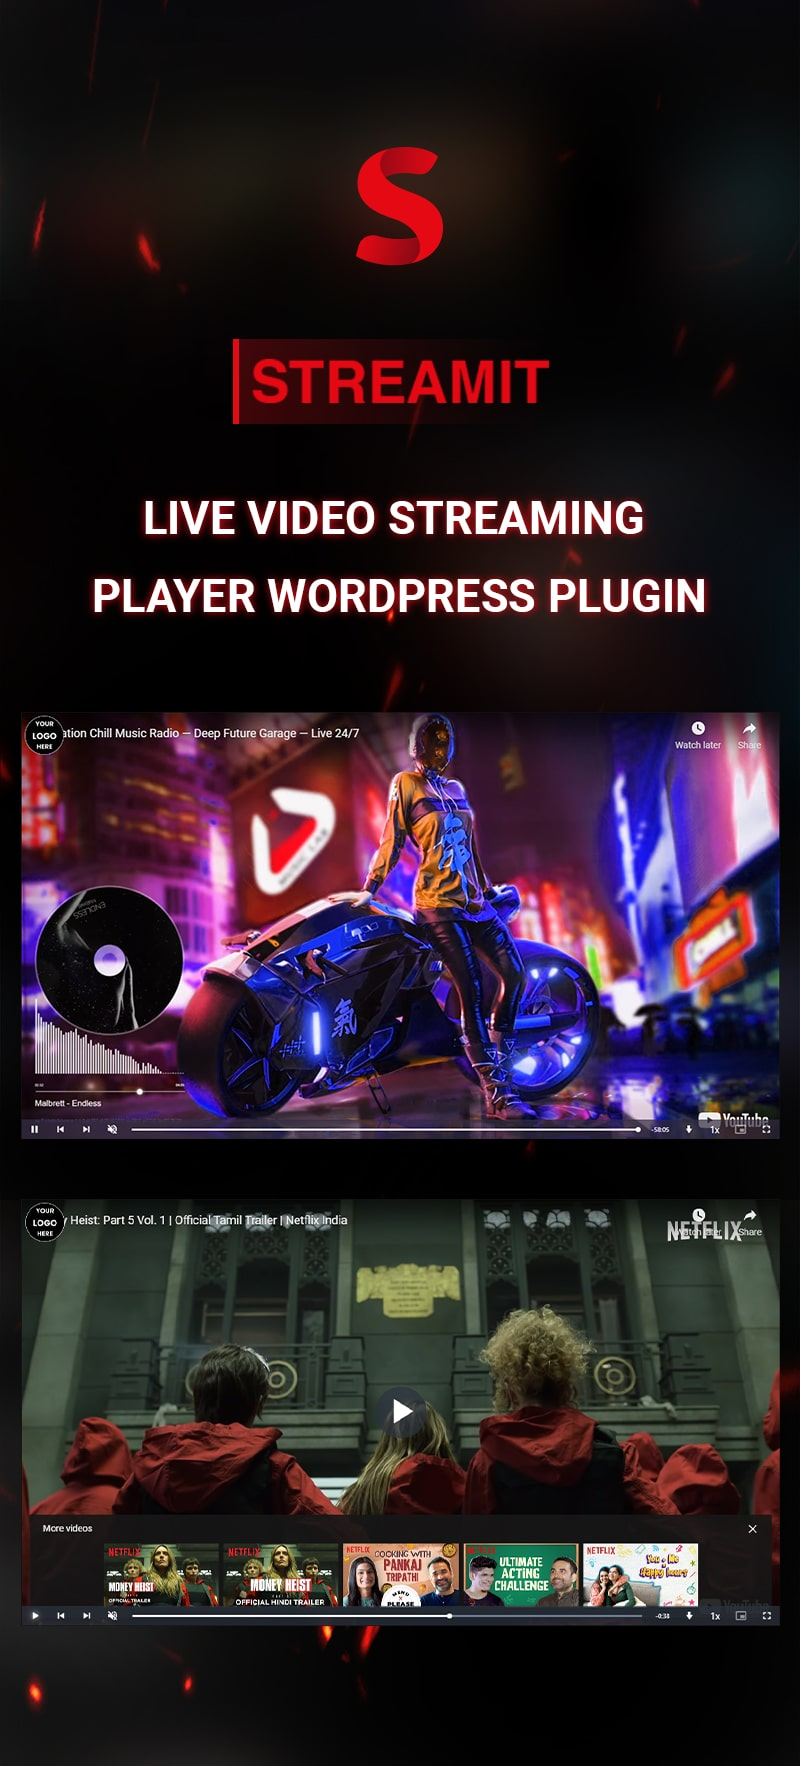 Live Video Streaming Player WordPress Plugin | Streamit | Iqonic Design live video streaming  player wordpress plugin Streamit 01 min